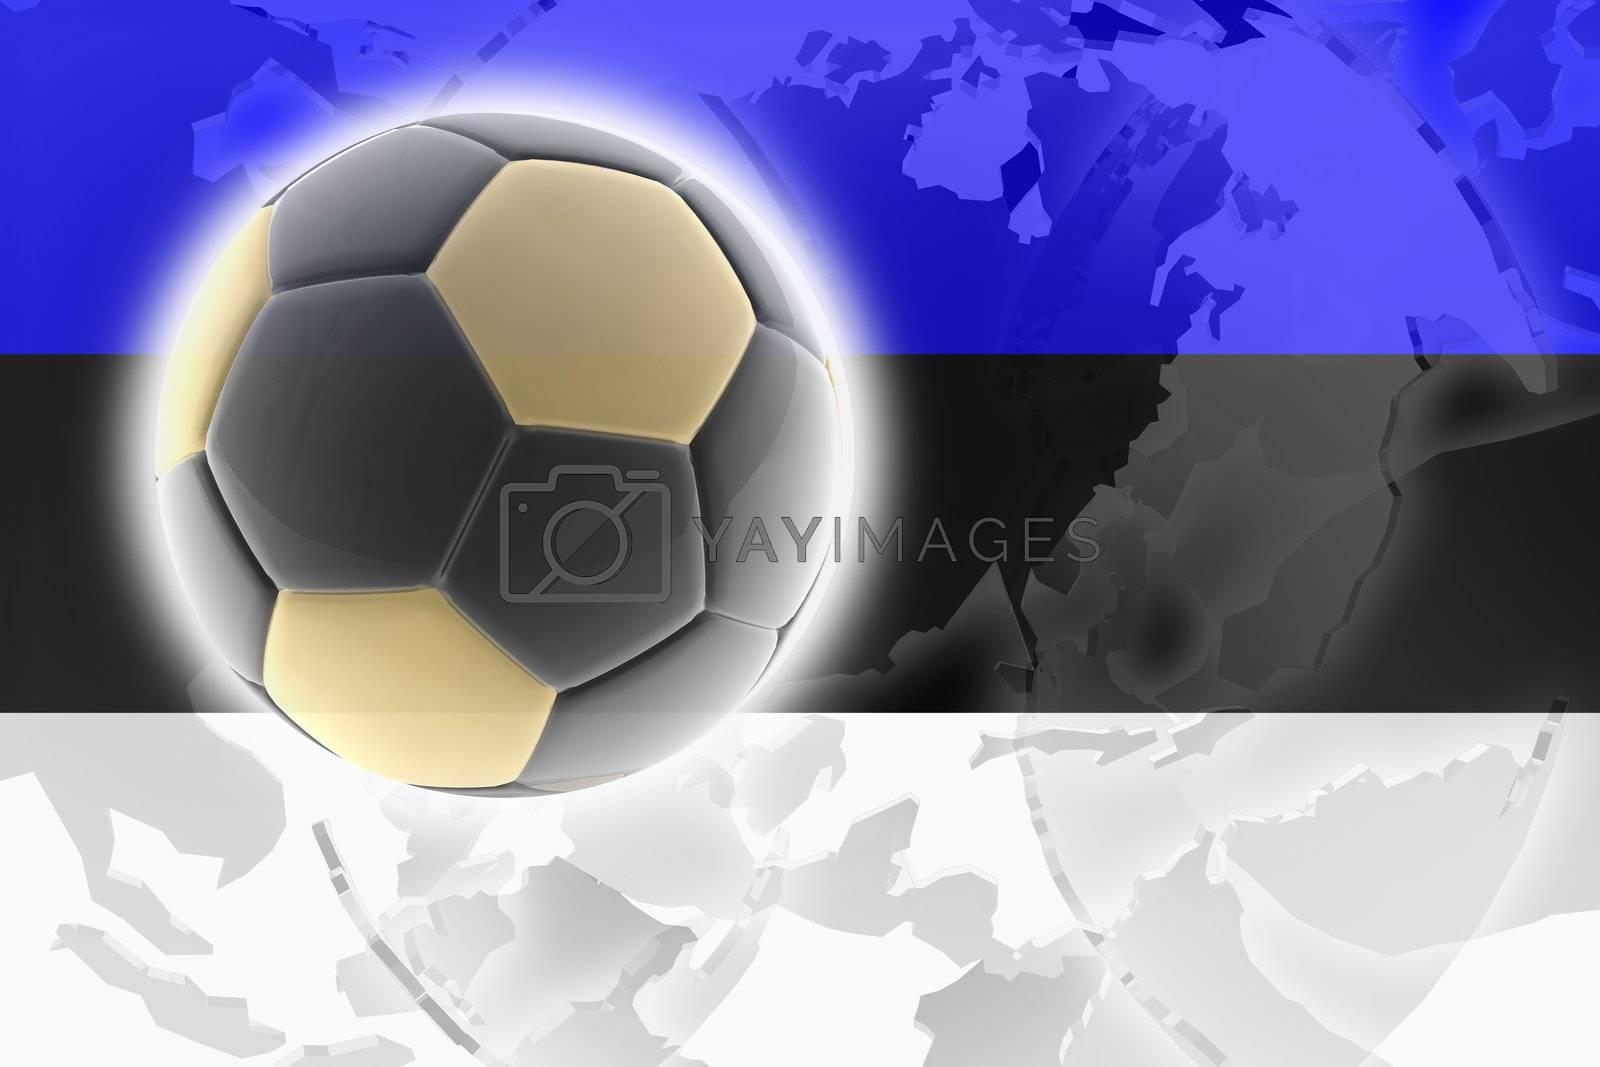 Flag of Estonia, national country symbol illustration sports soccer football